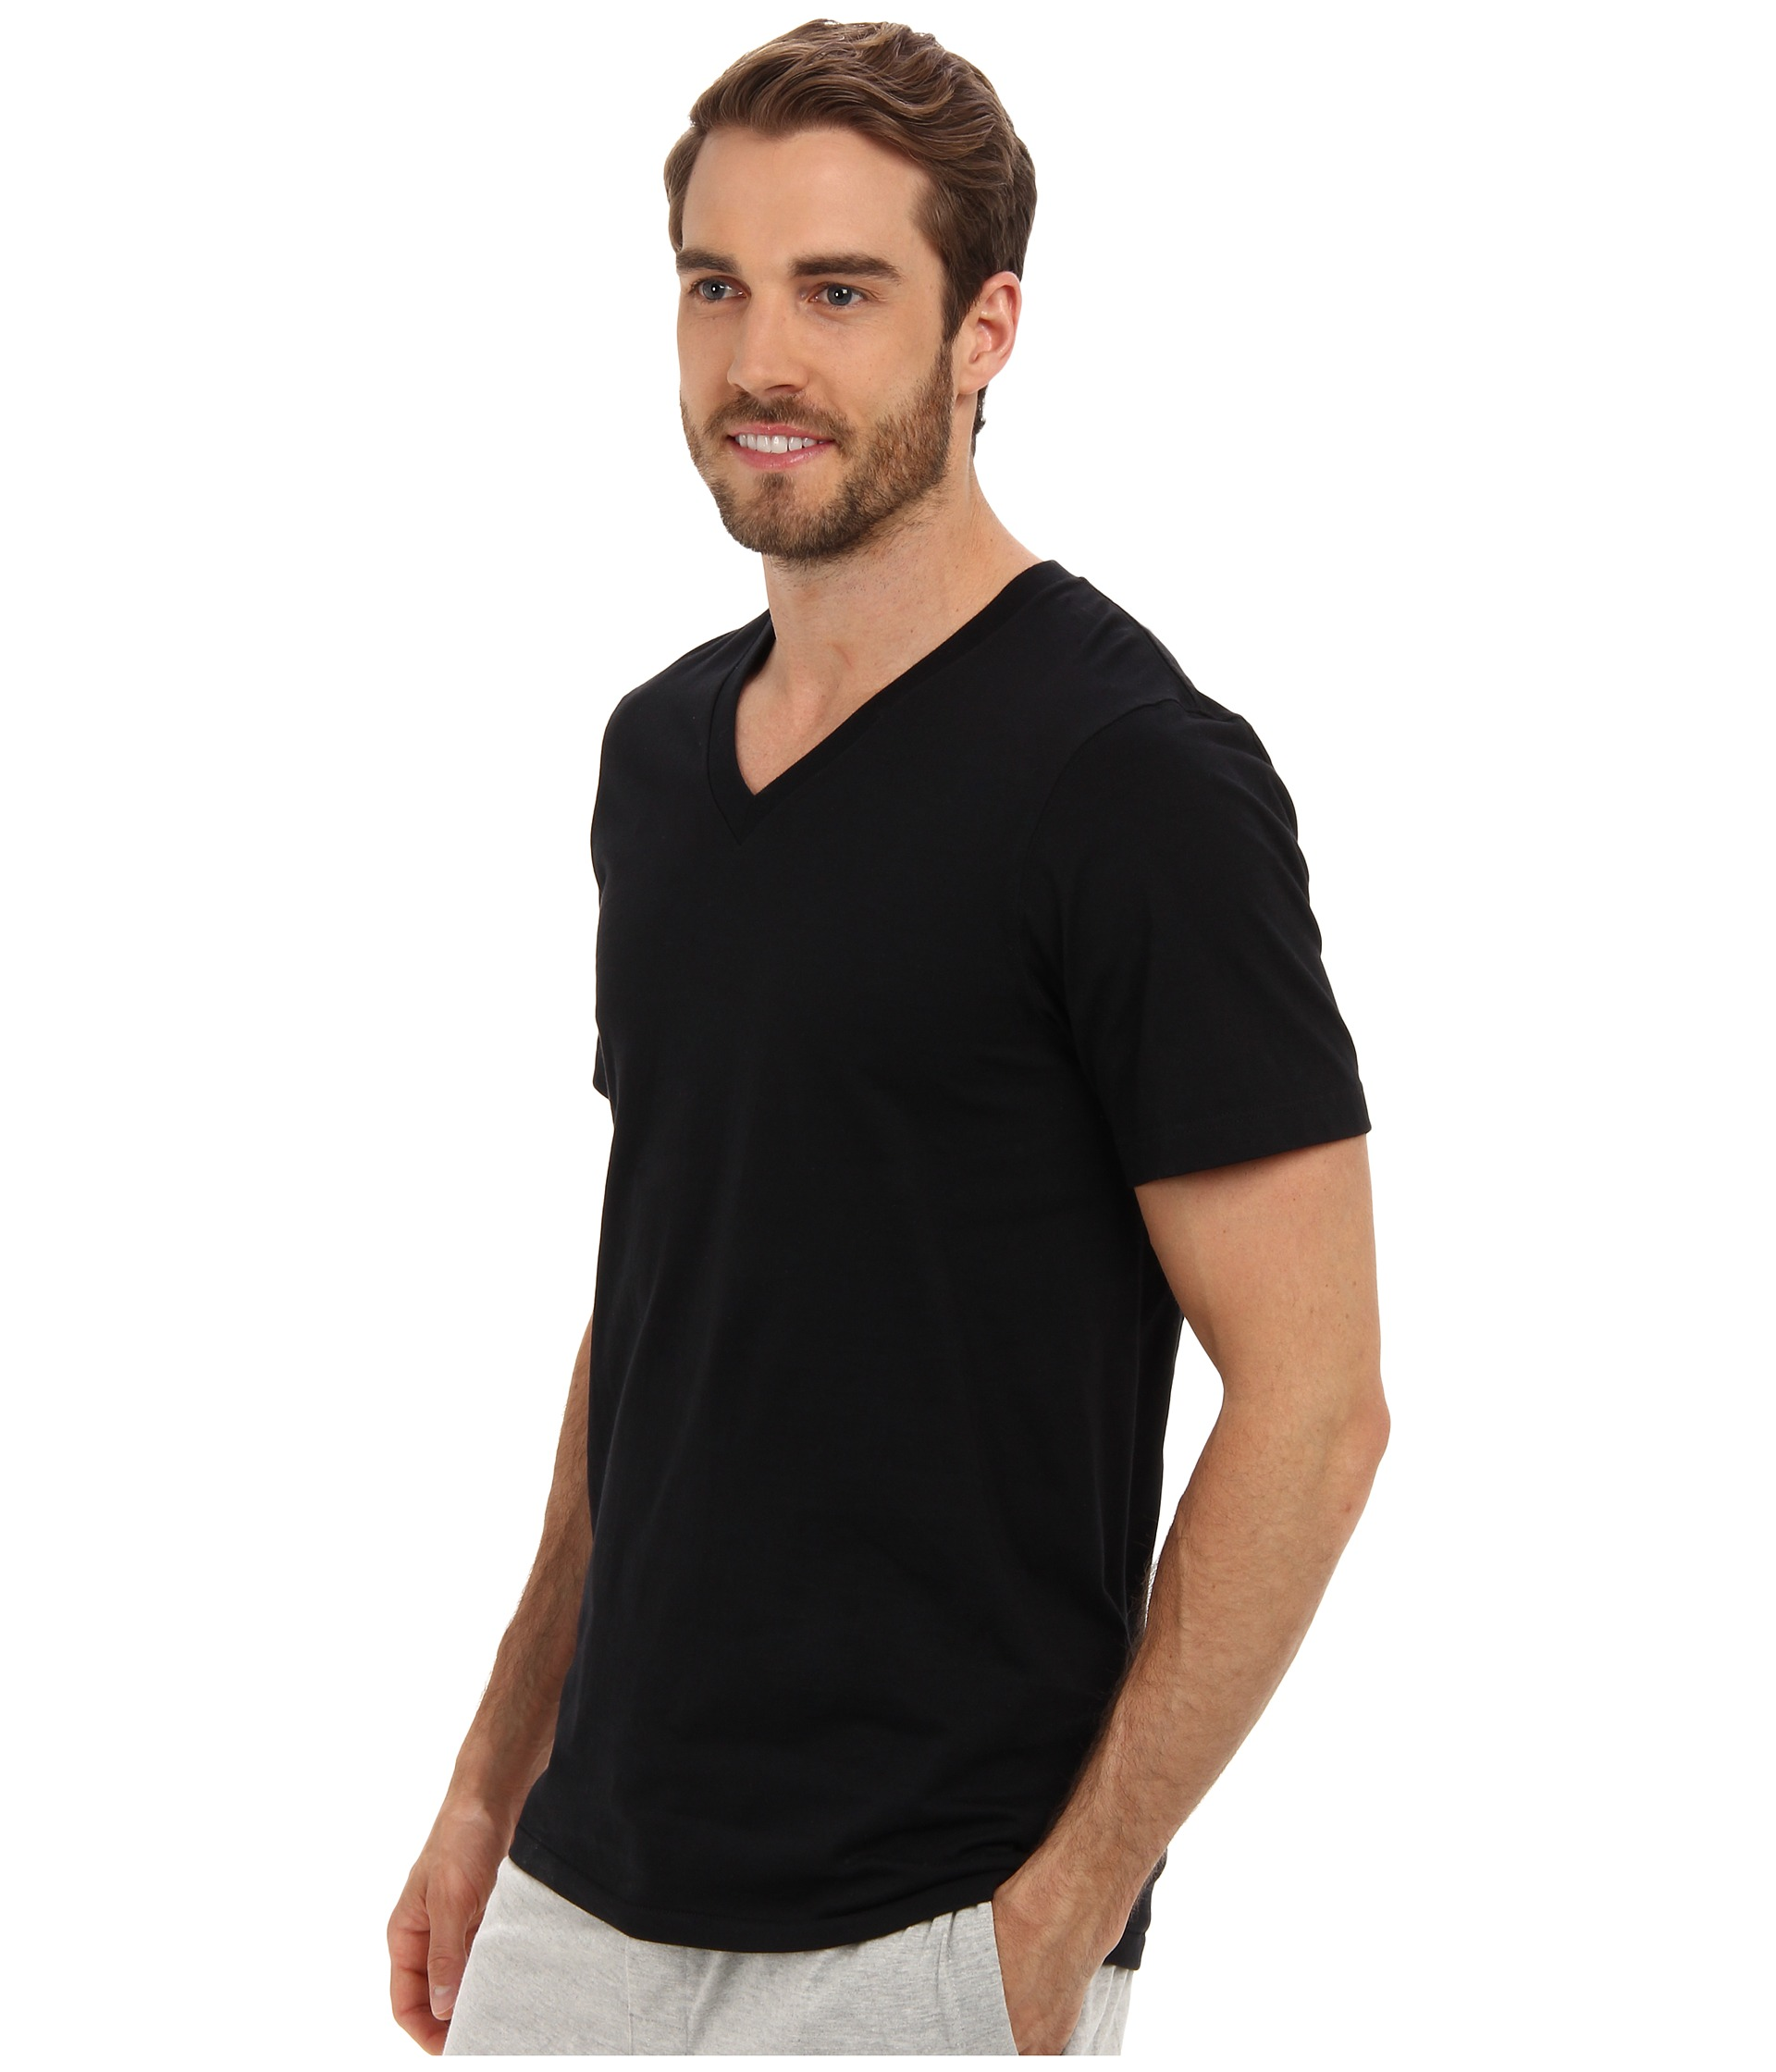 Jockey cotton v neck t shirt 3 pack black for Jockey v neck shirt